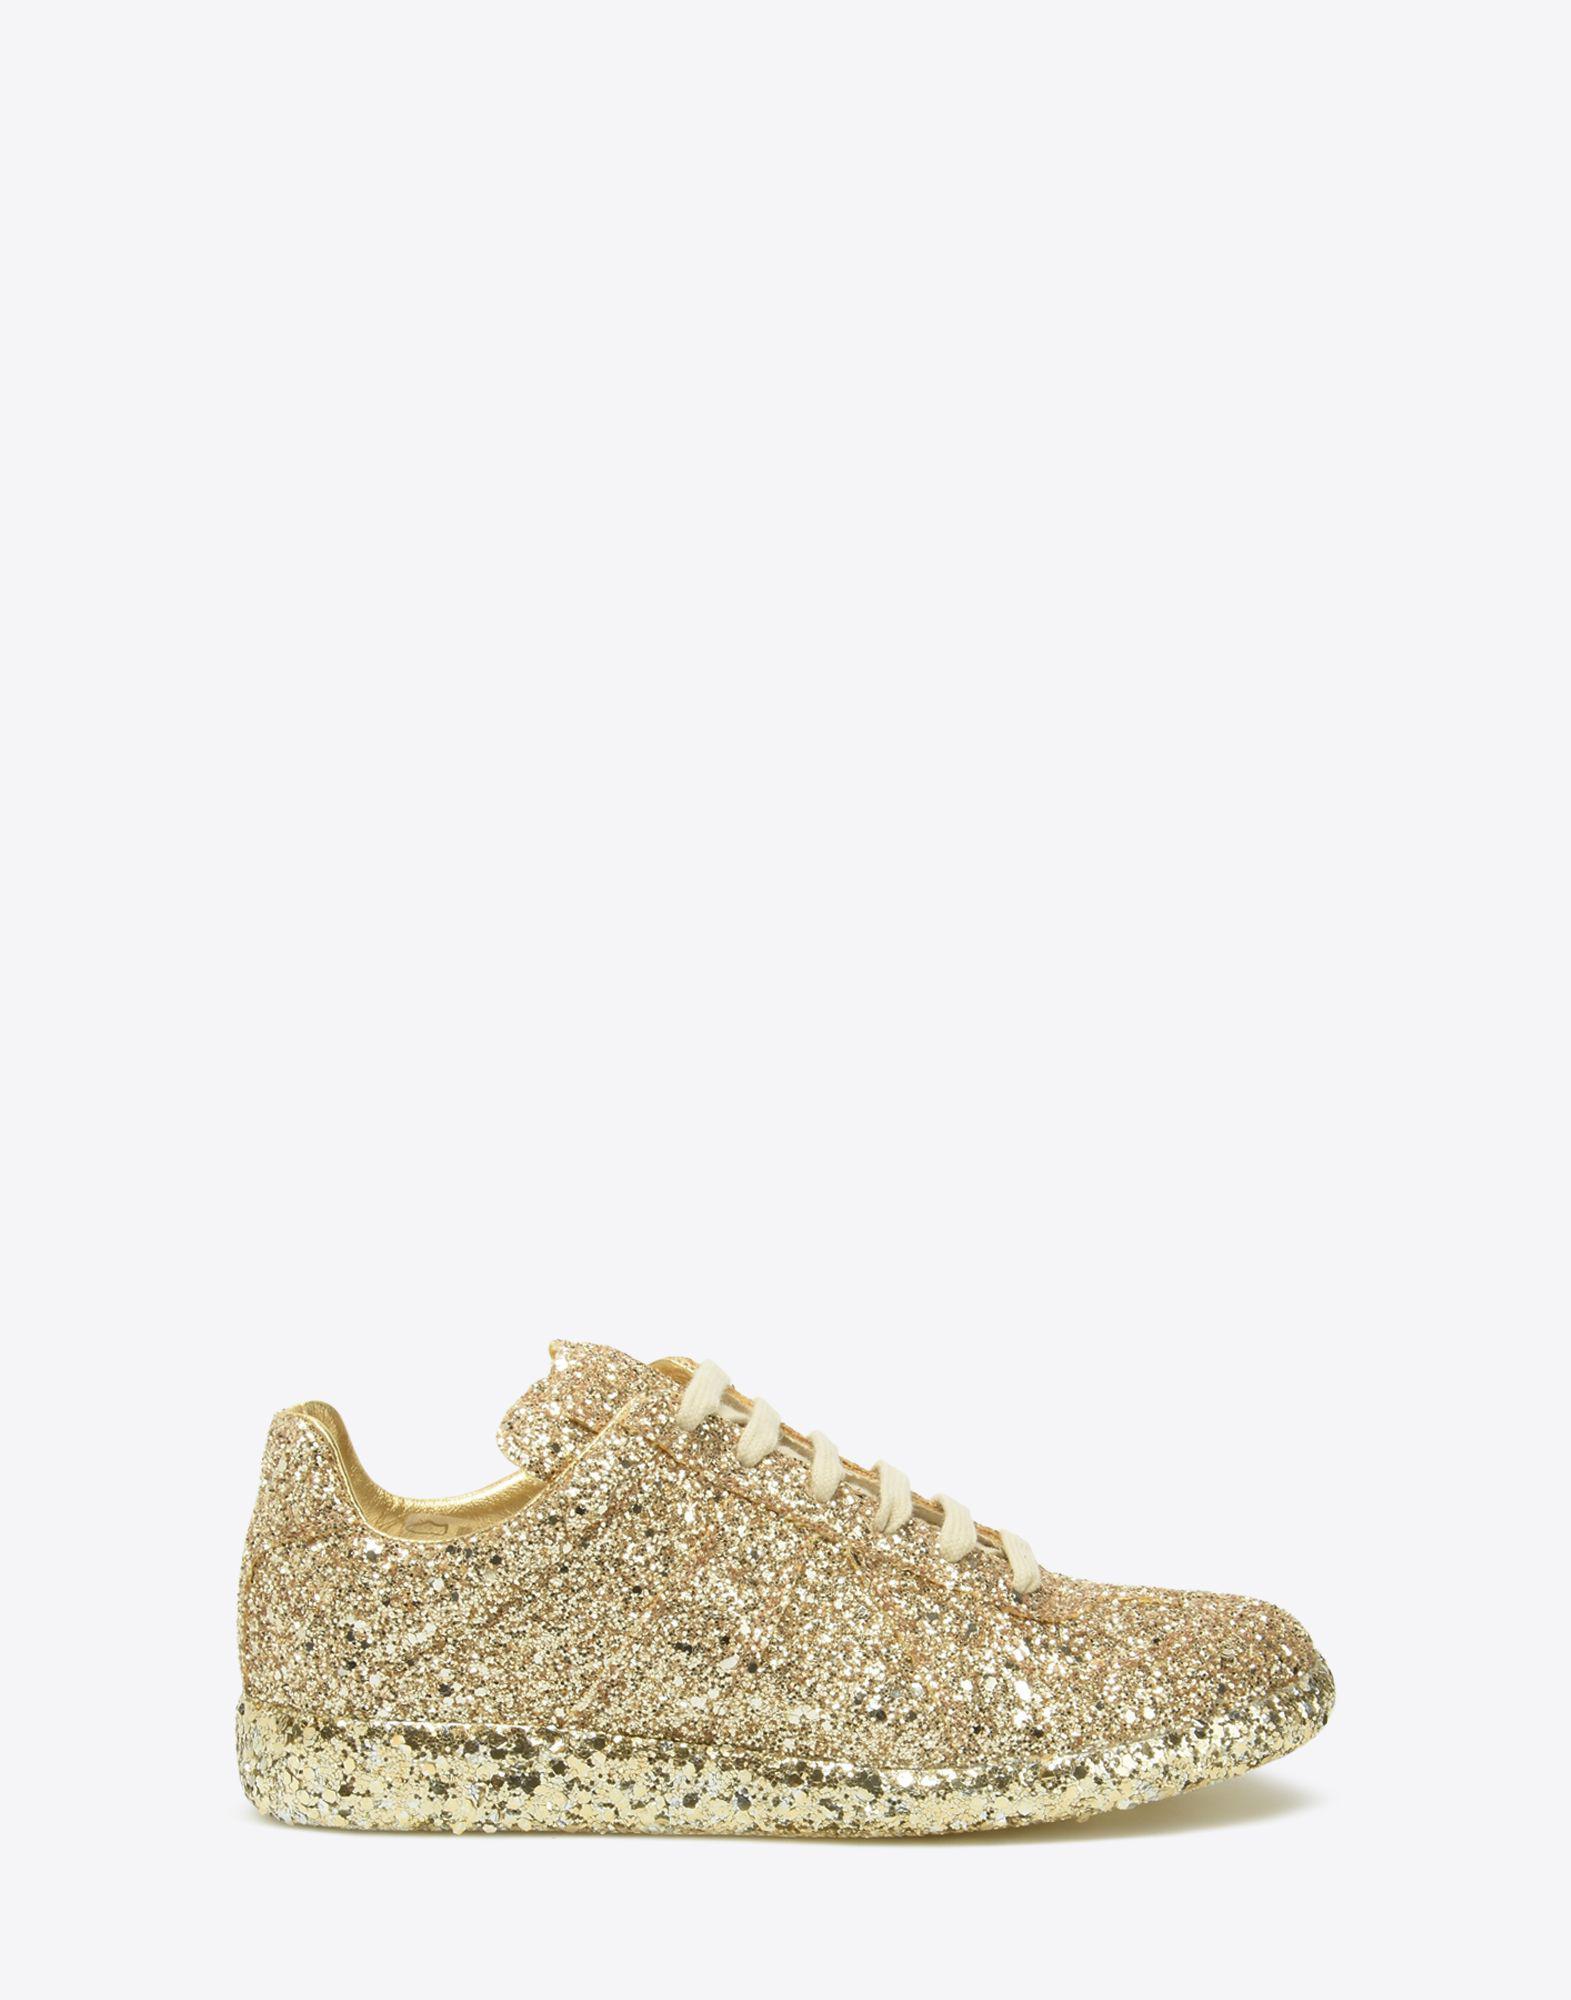 Replica glitter sneakers - Metallic Maison Martin Margiela 5HGjK